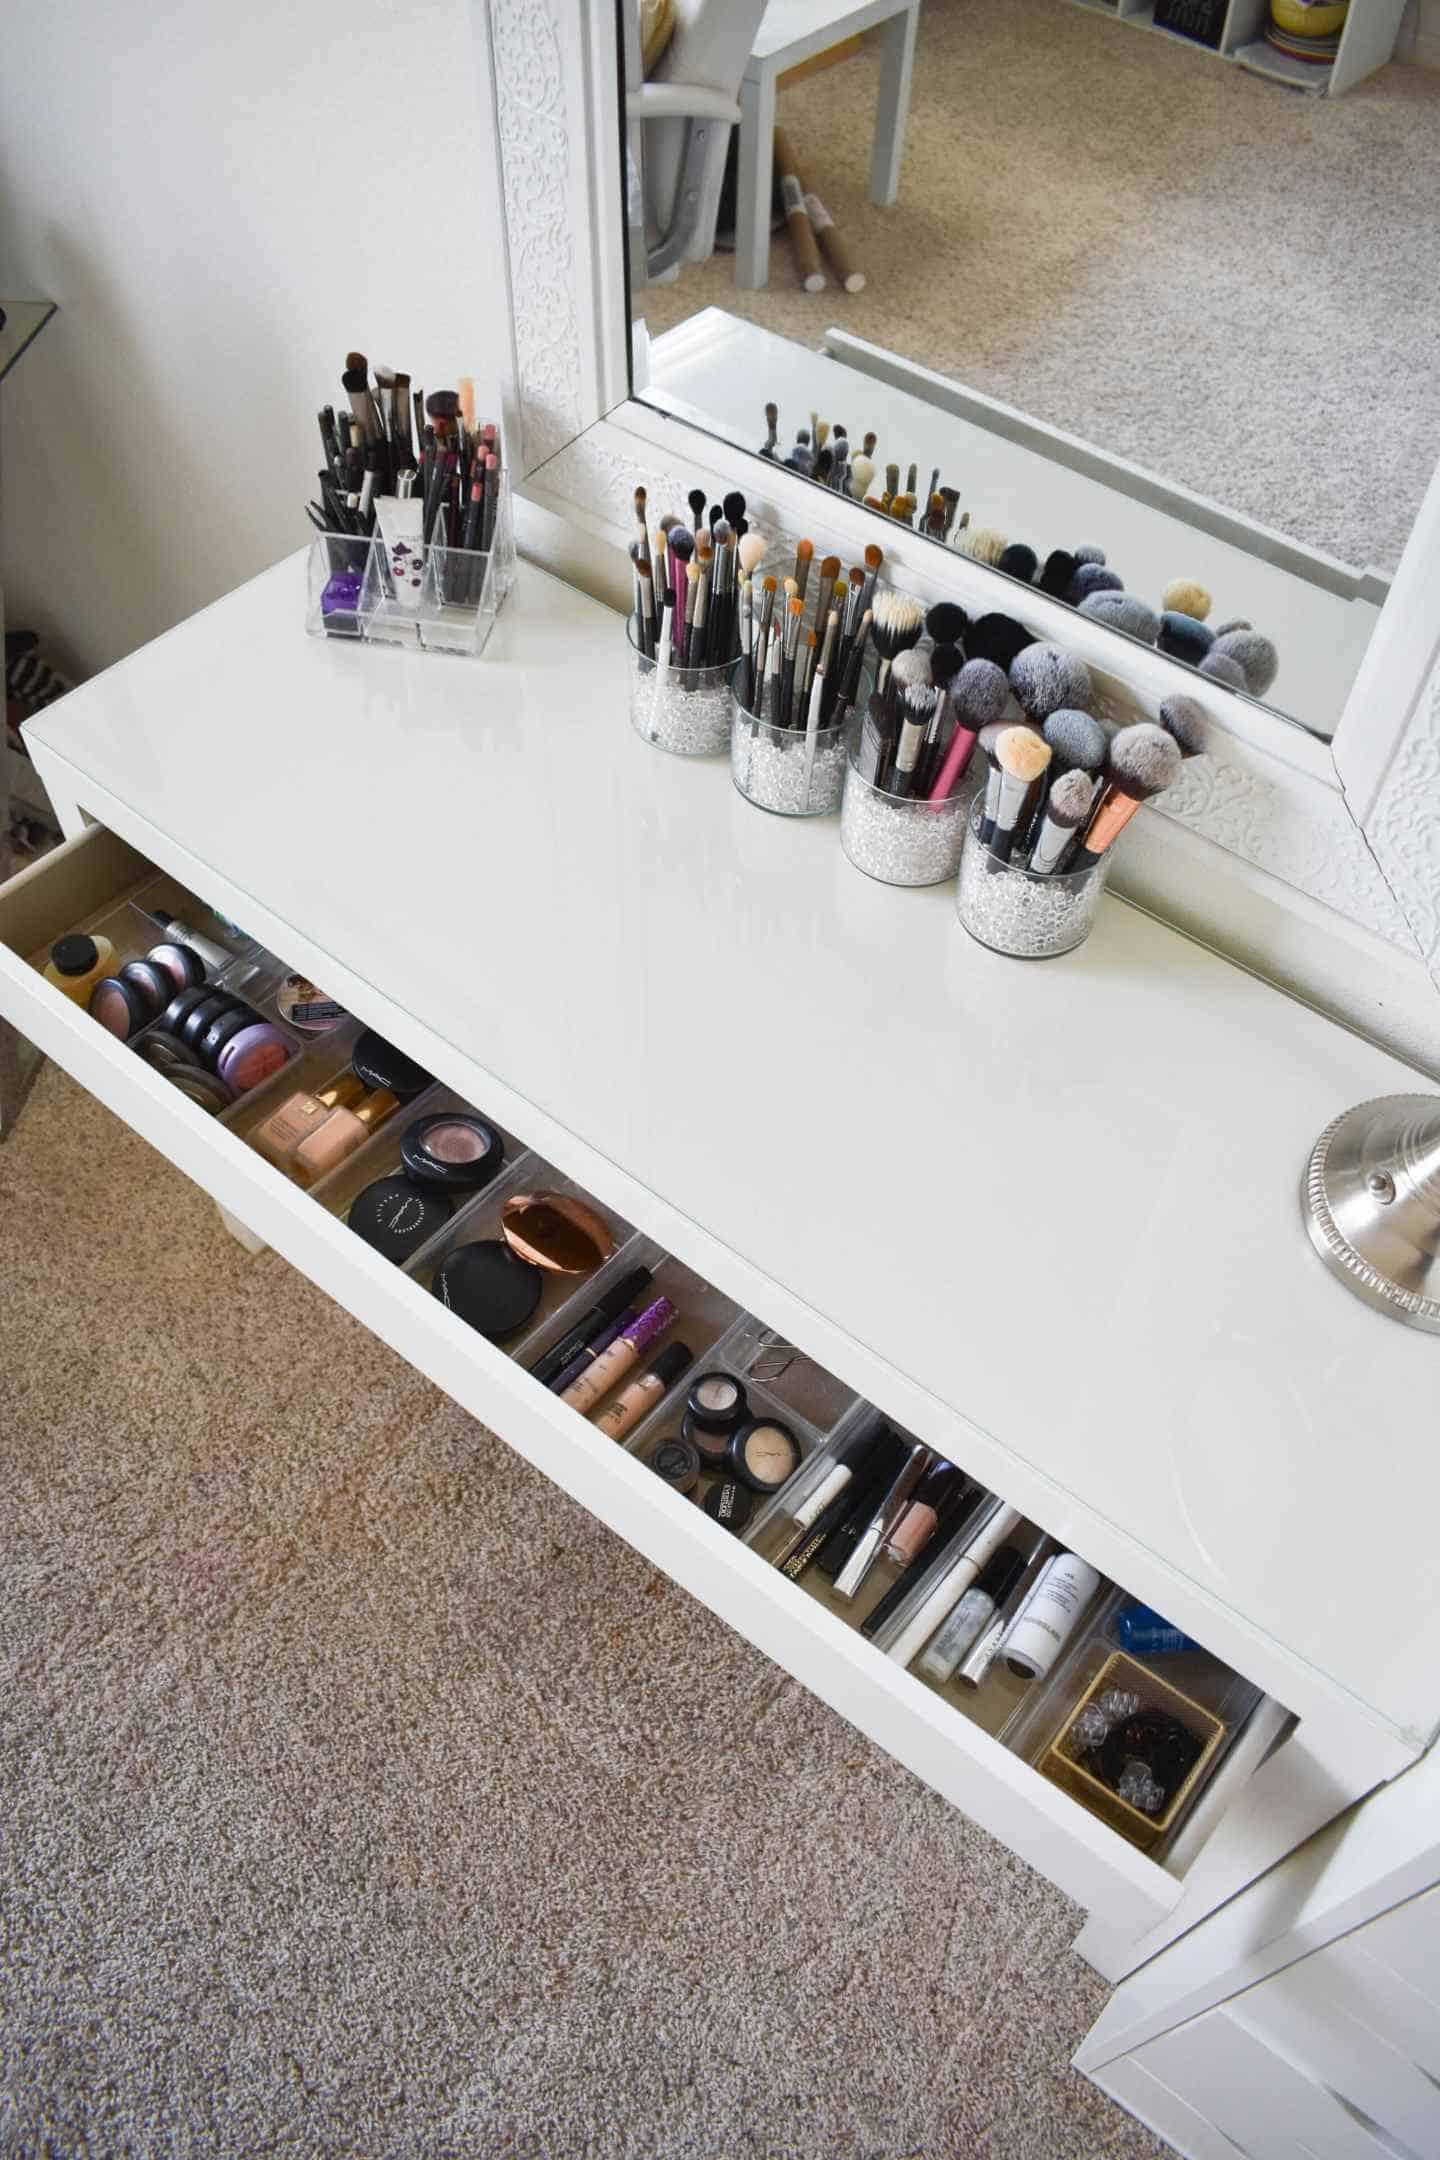 30 DIY Makeup Organizer Ideas in 2021